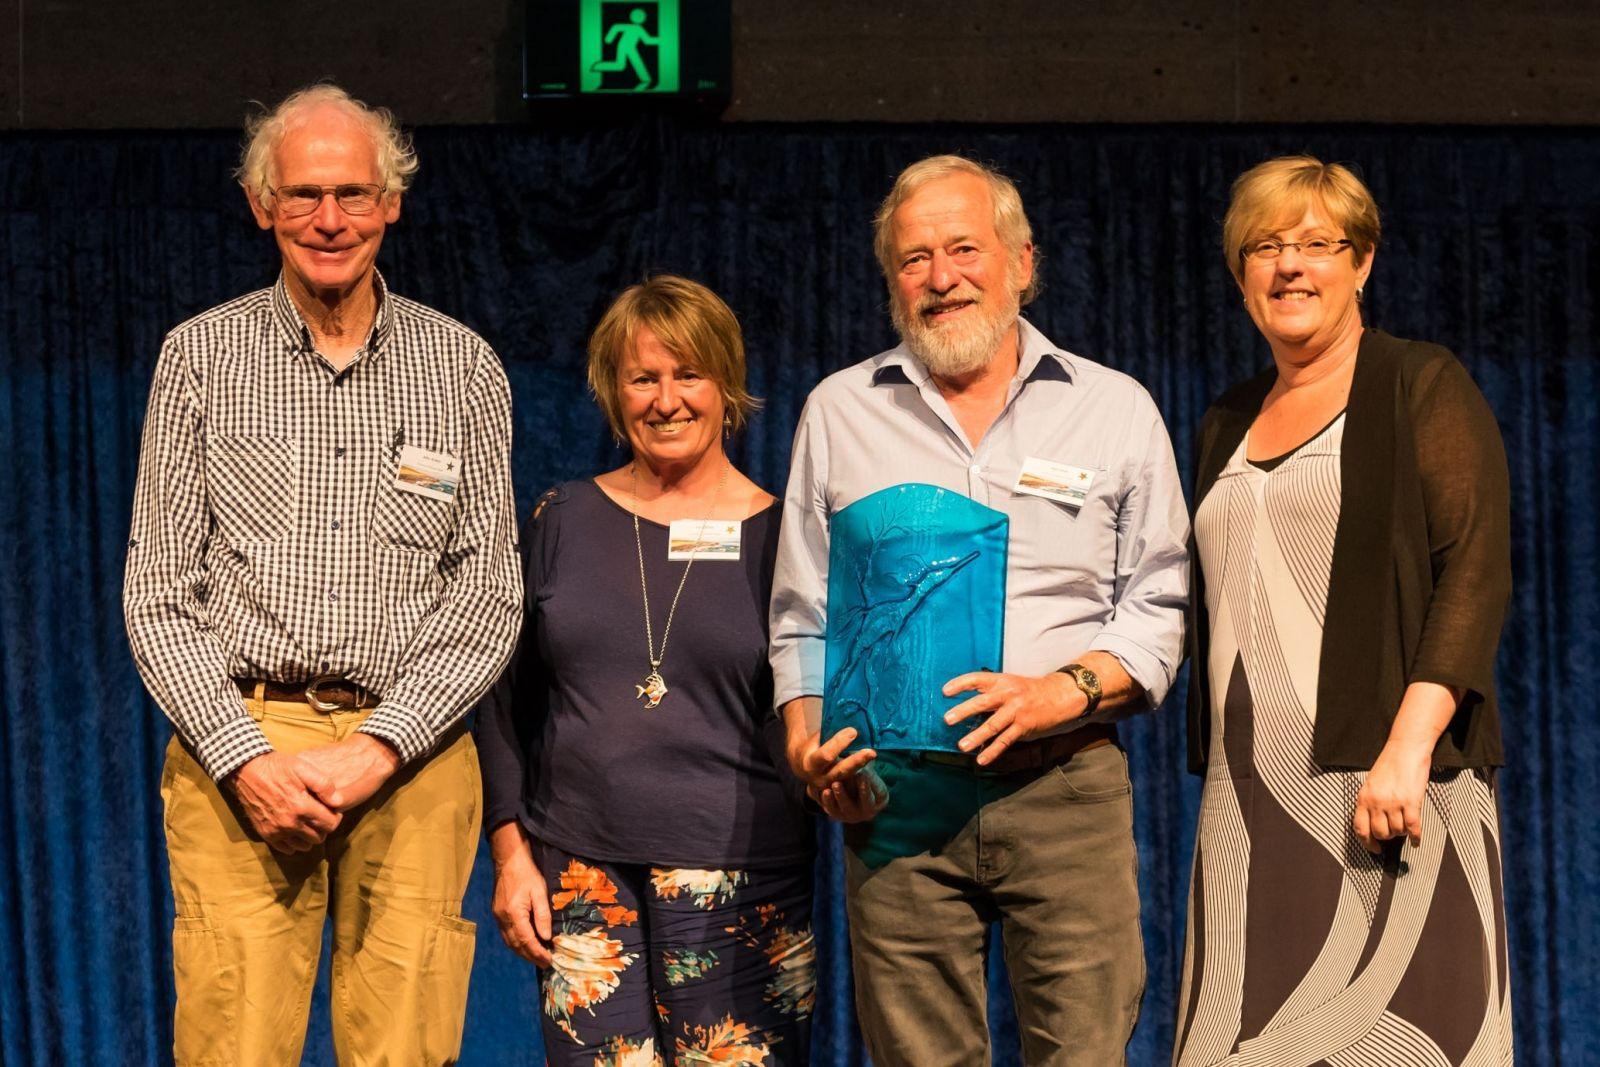 Community Engagement Award: Friends of Beware Reef - Community Engagement & Marine Species Monitoring